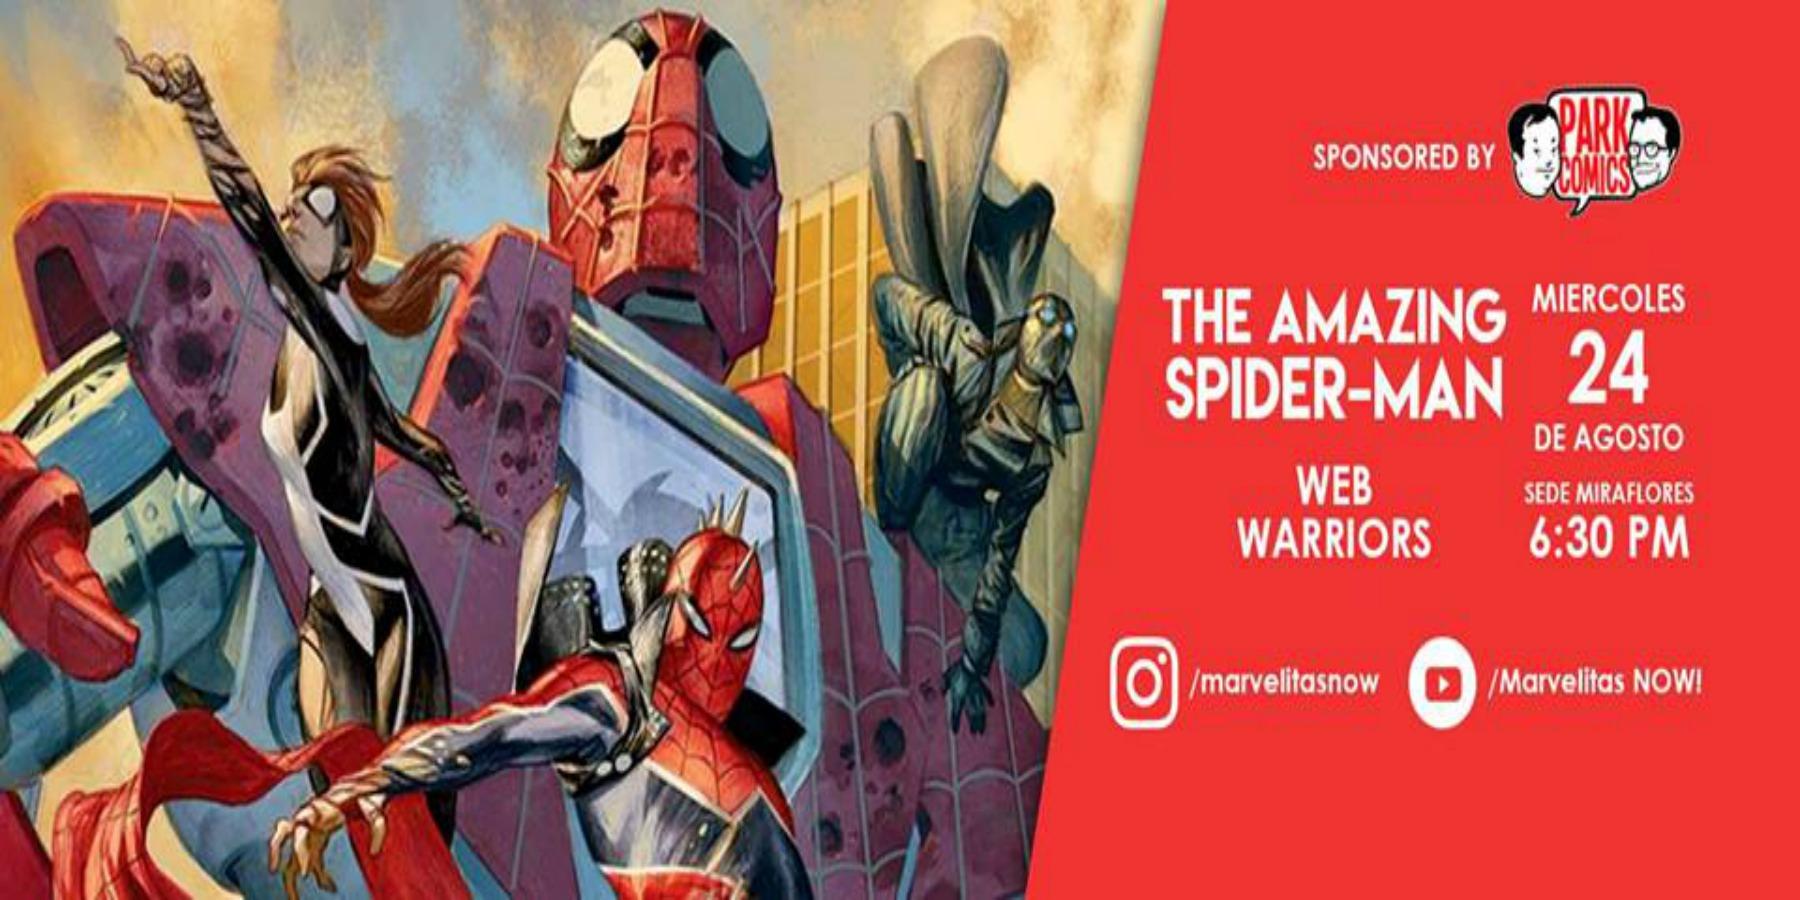 Spider Man Web Warriors | ICPNA de Miraflores